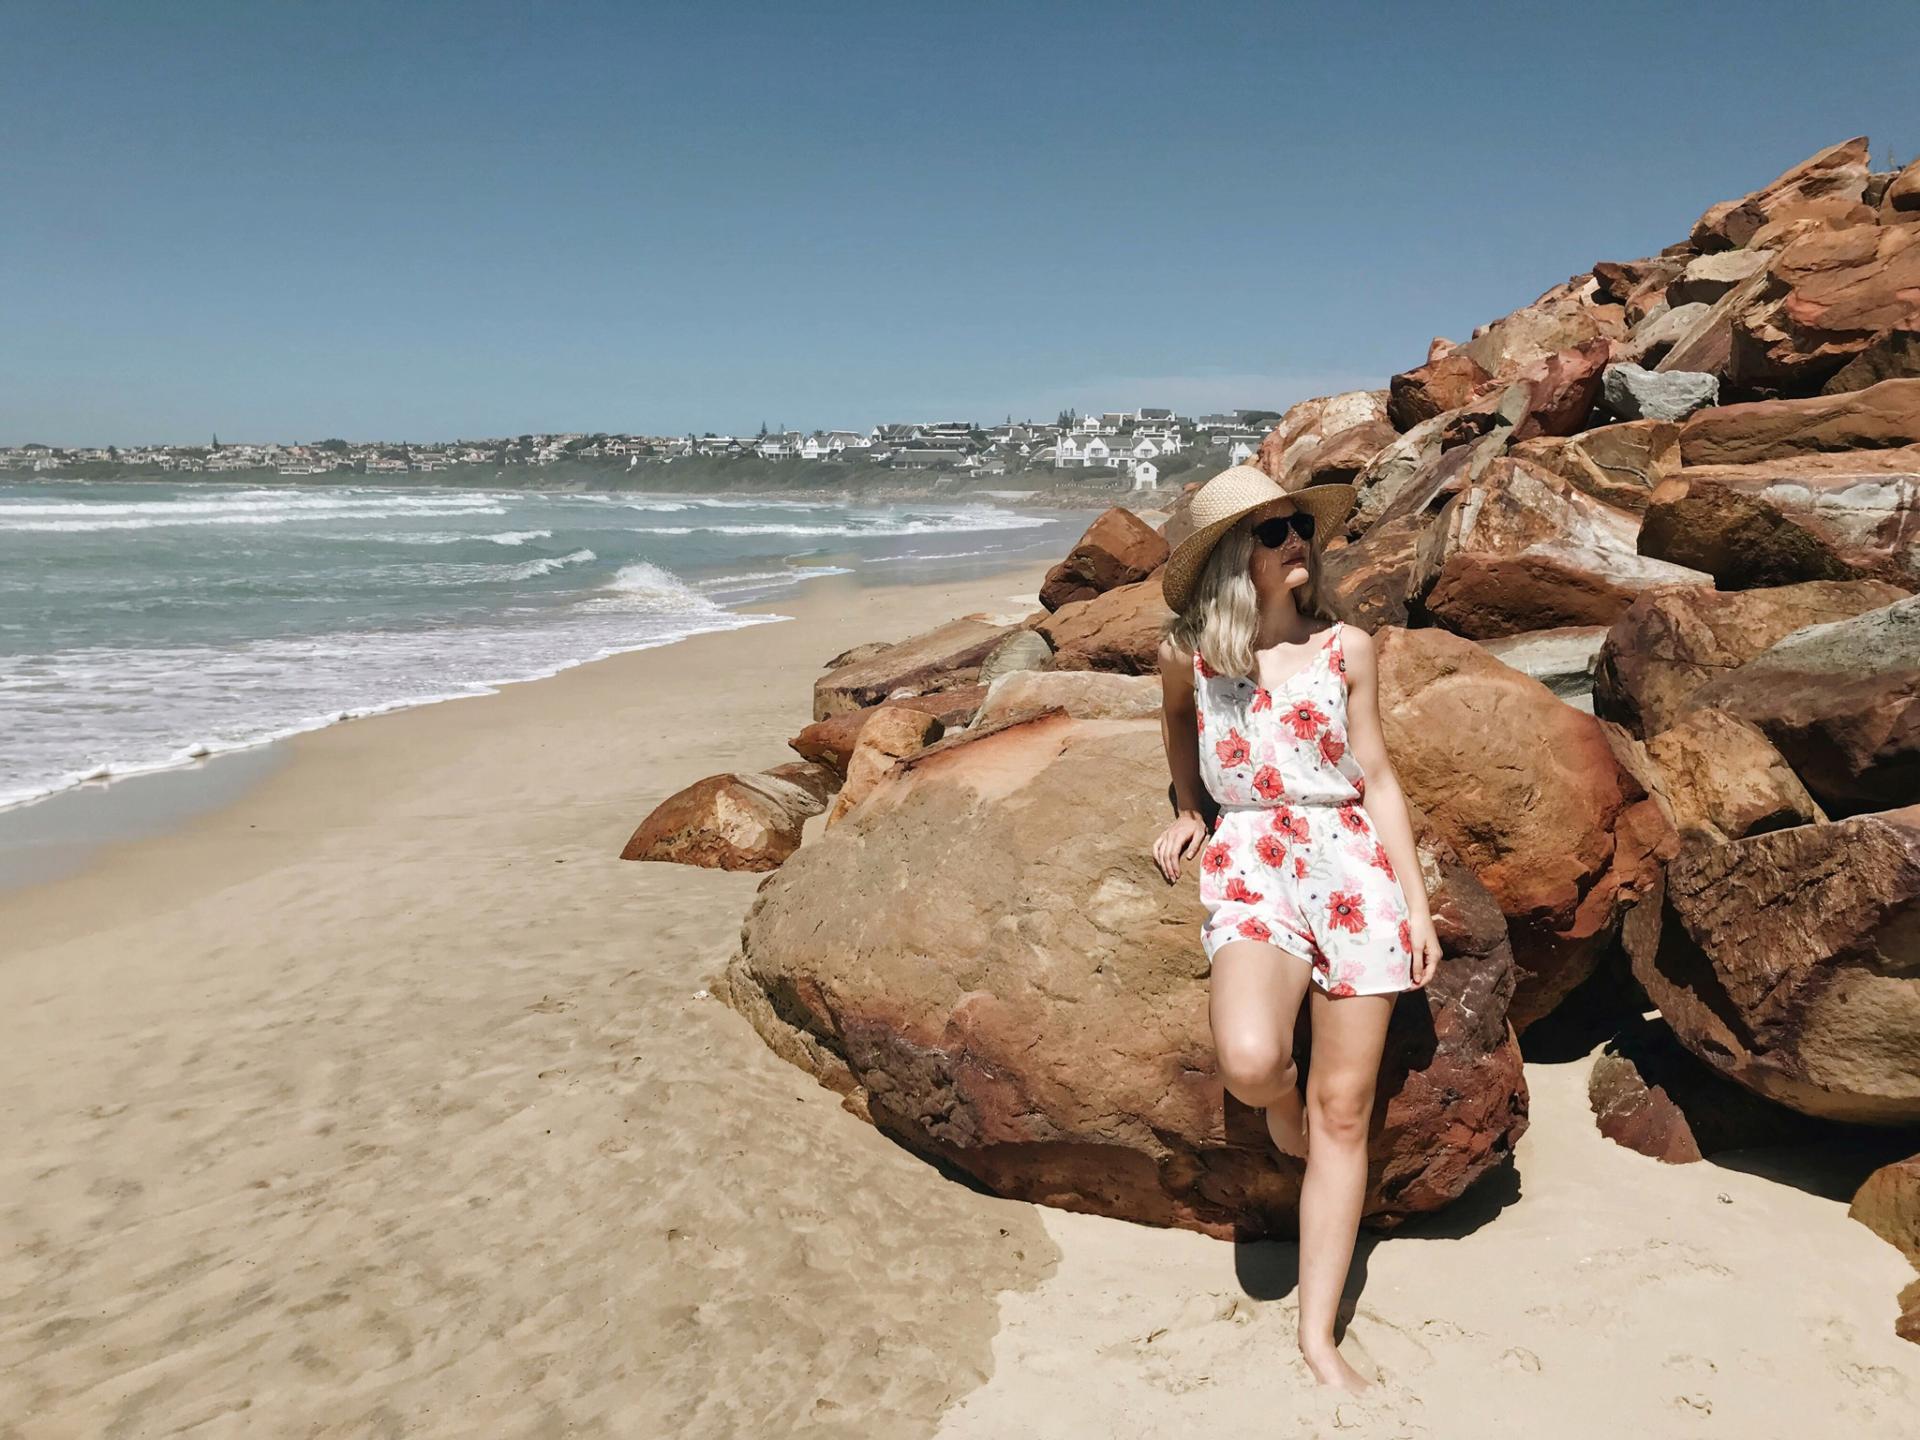 Lauren Carmen leans on the rocks behind her